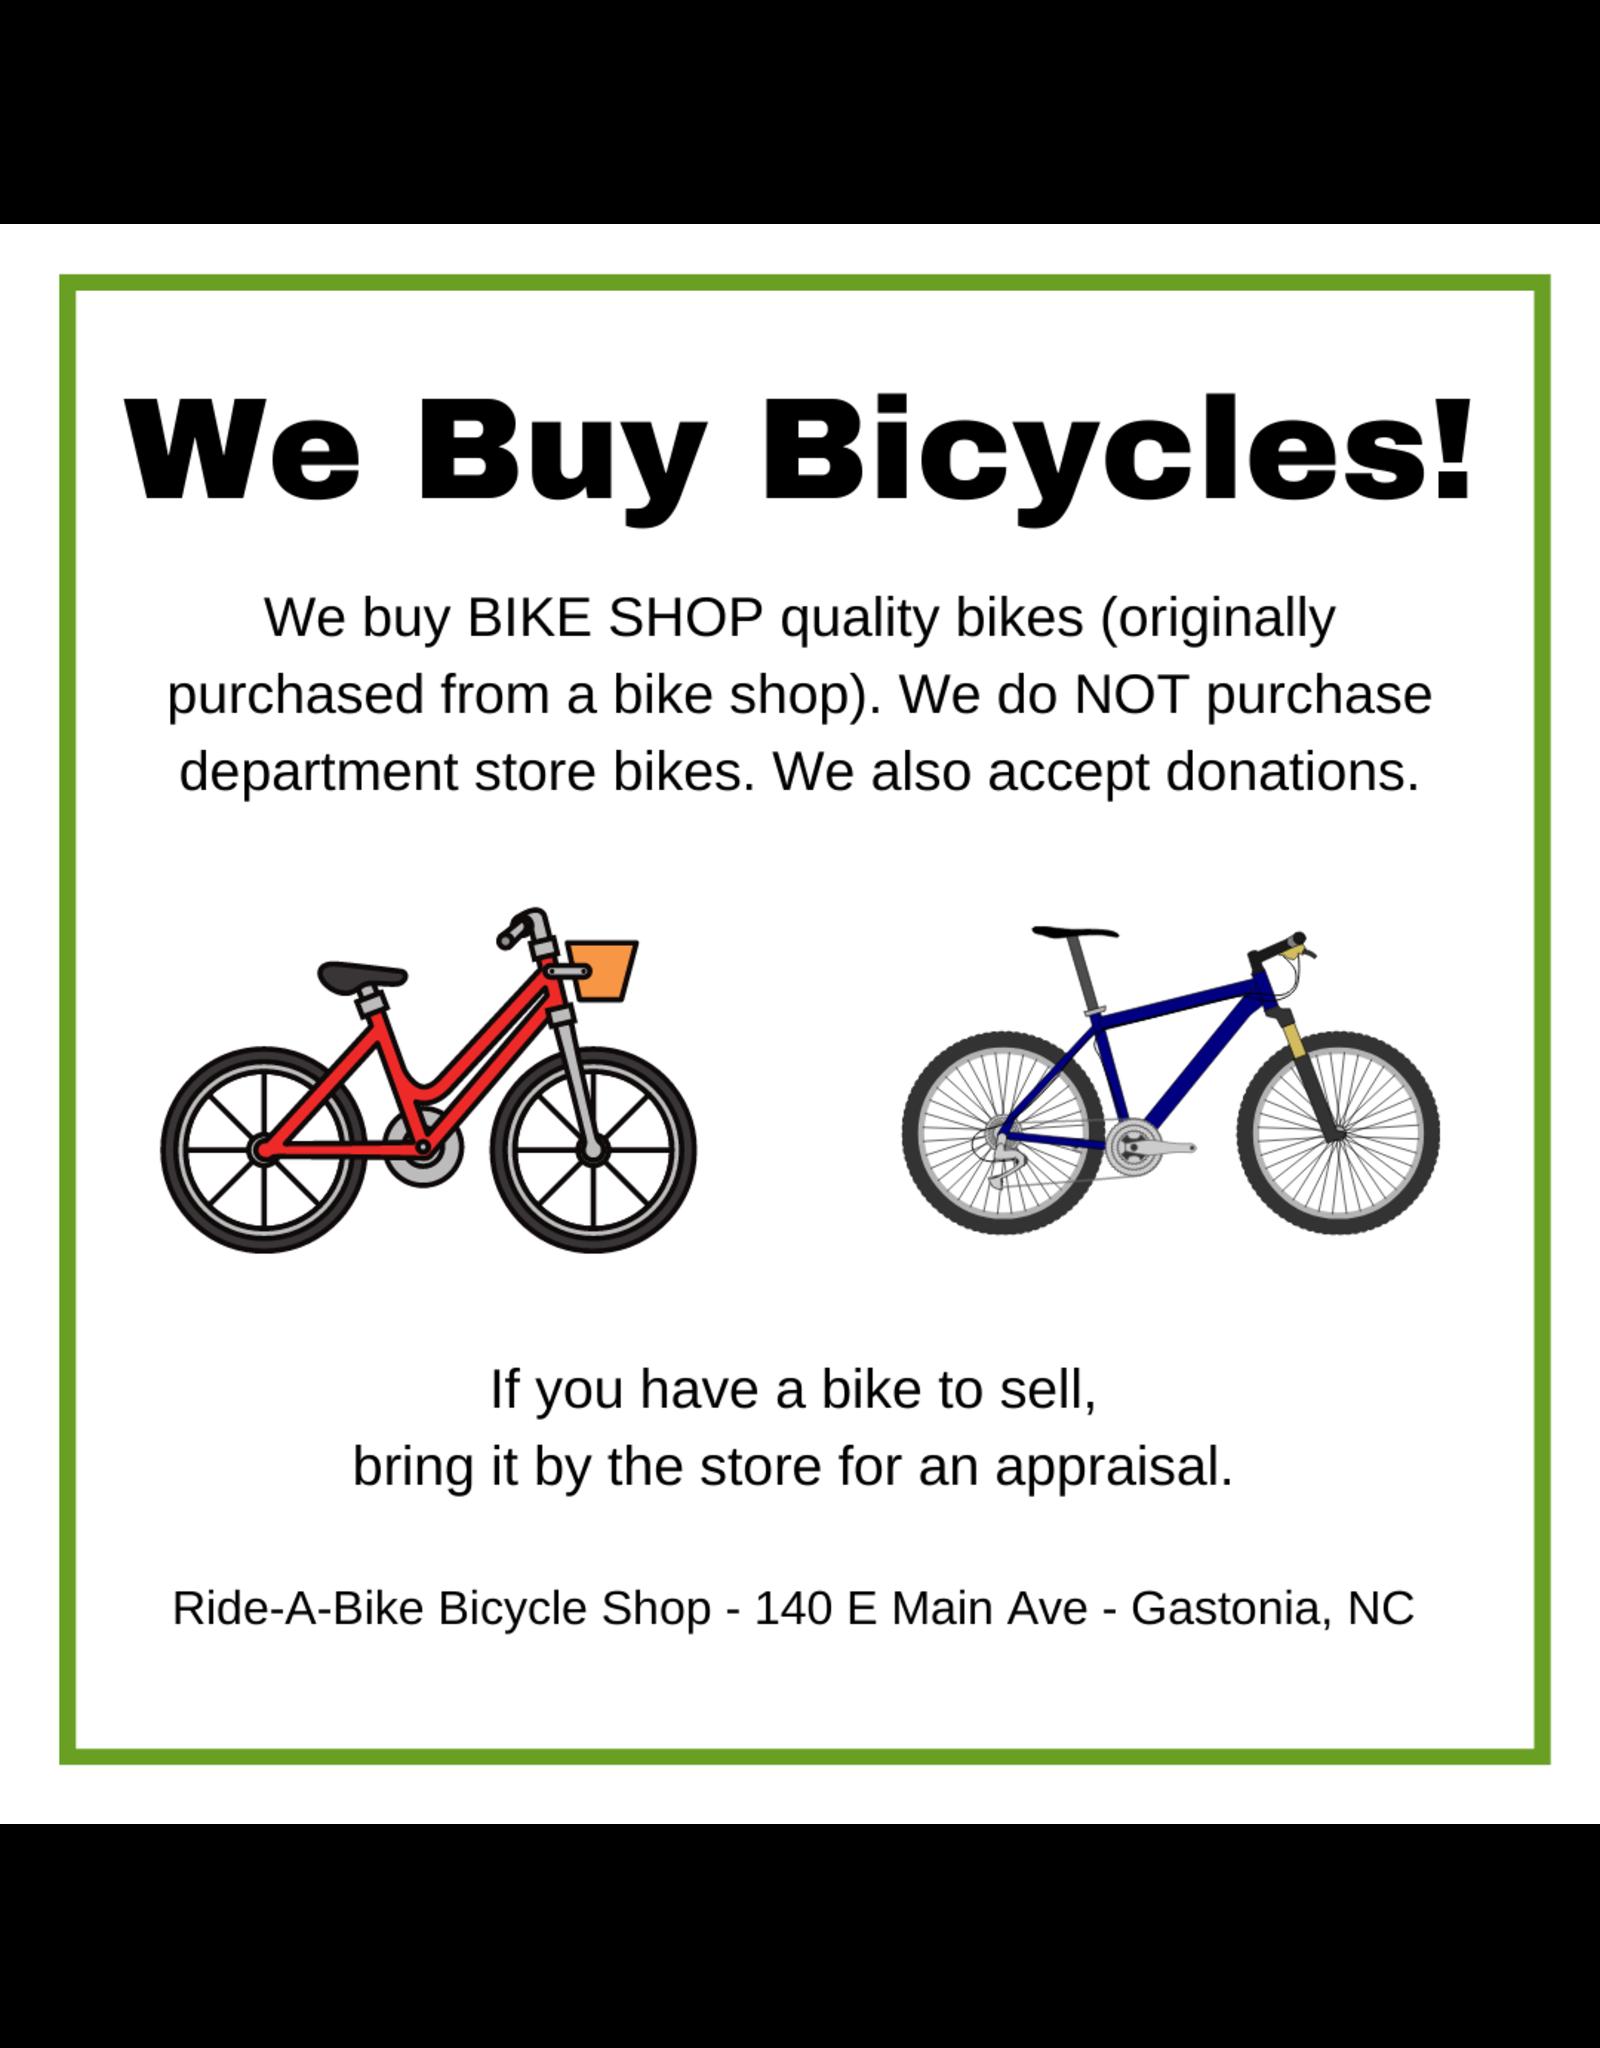 We Buy Bikes!